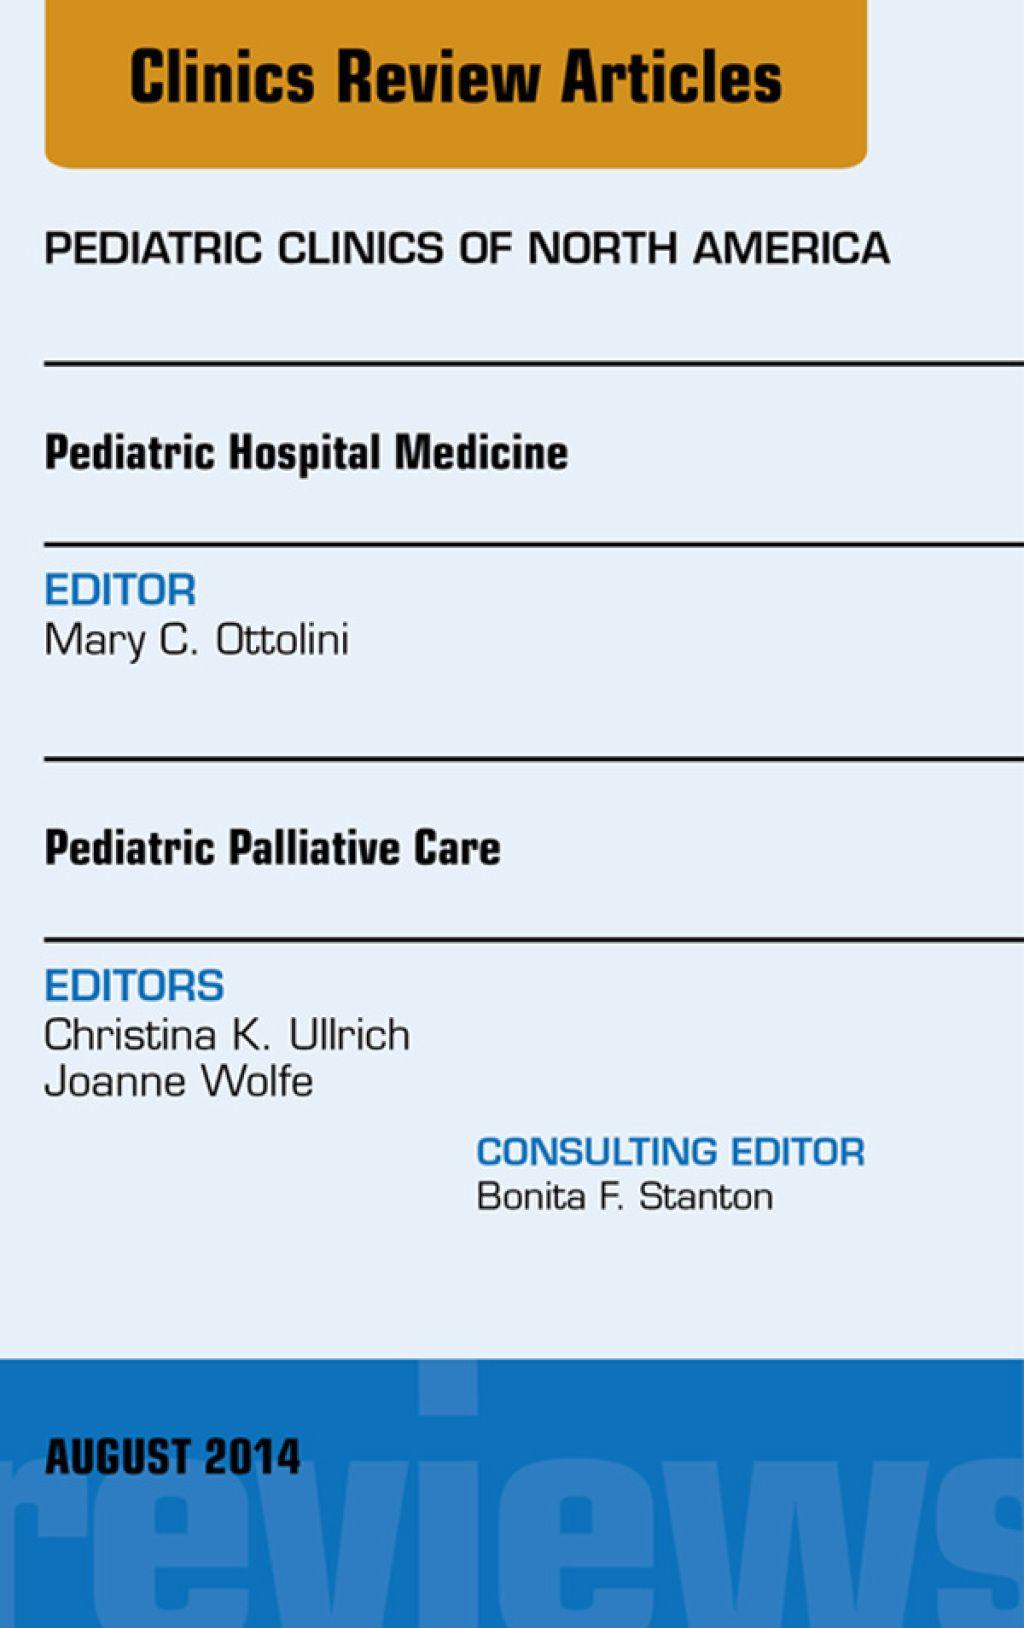 Pediatric Hospital Medicine and Pediatric Palliative Care